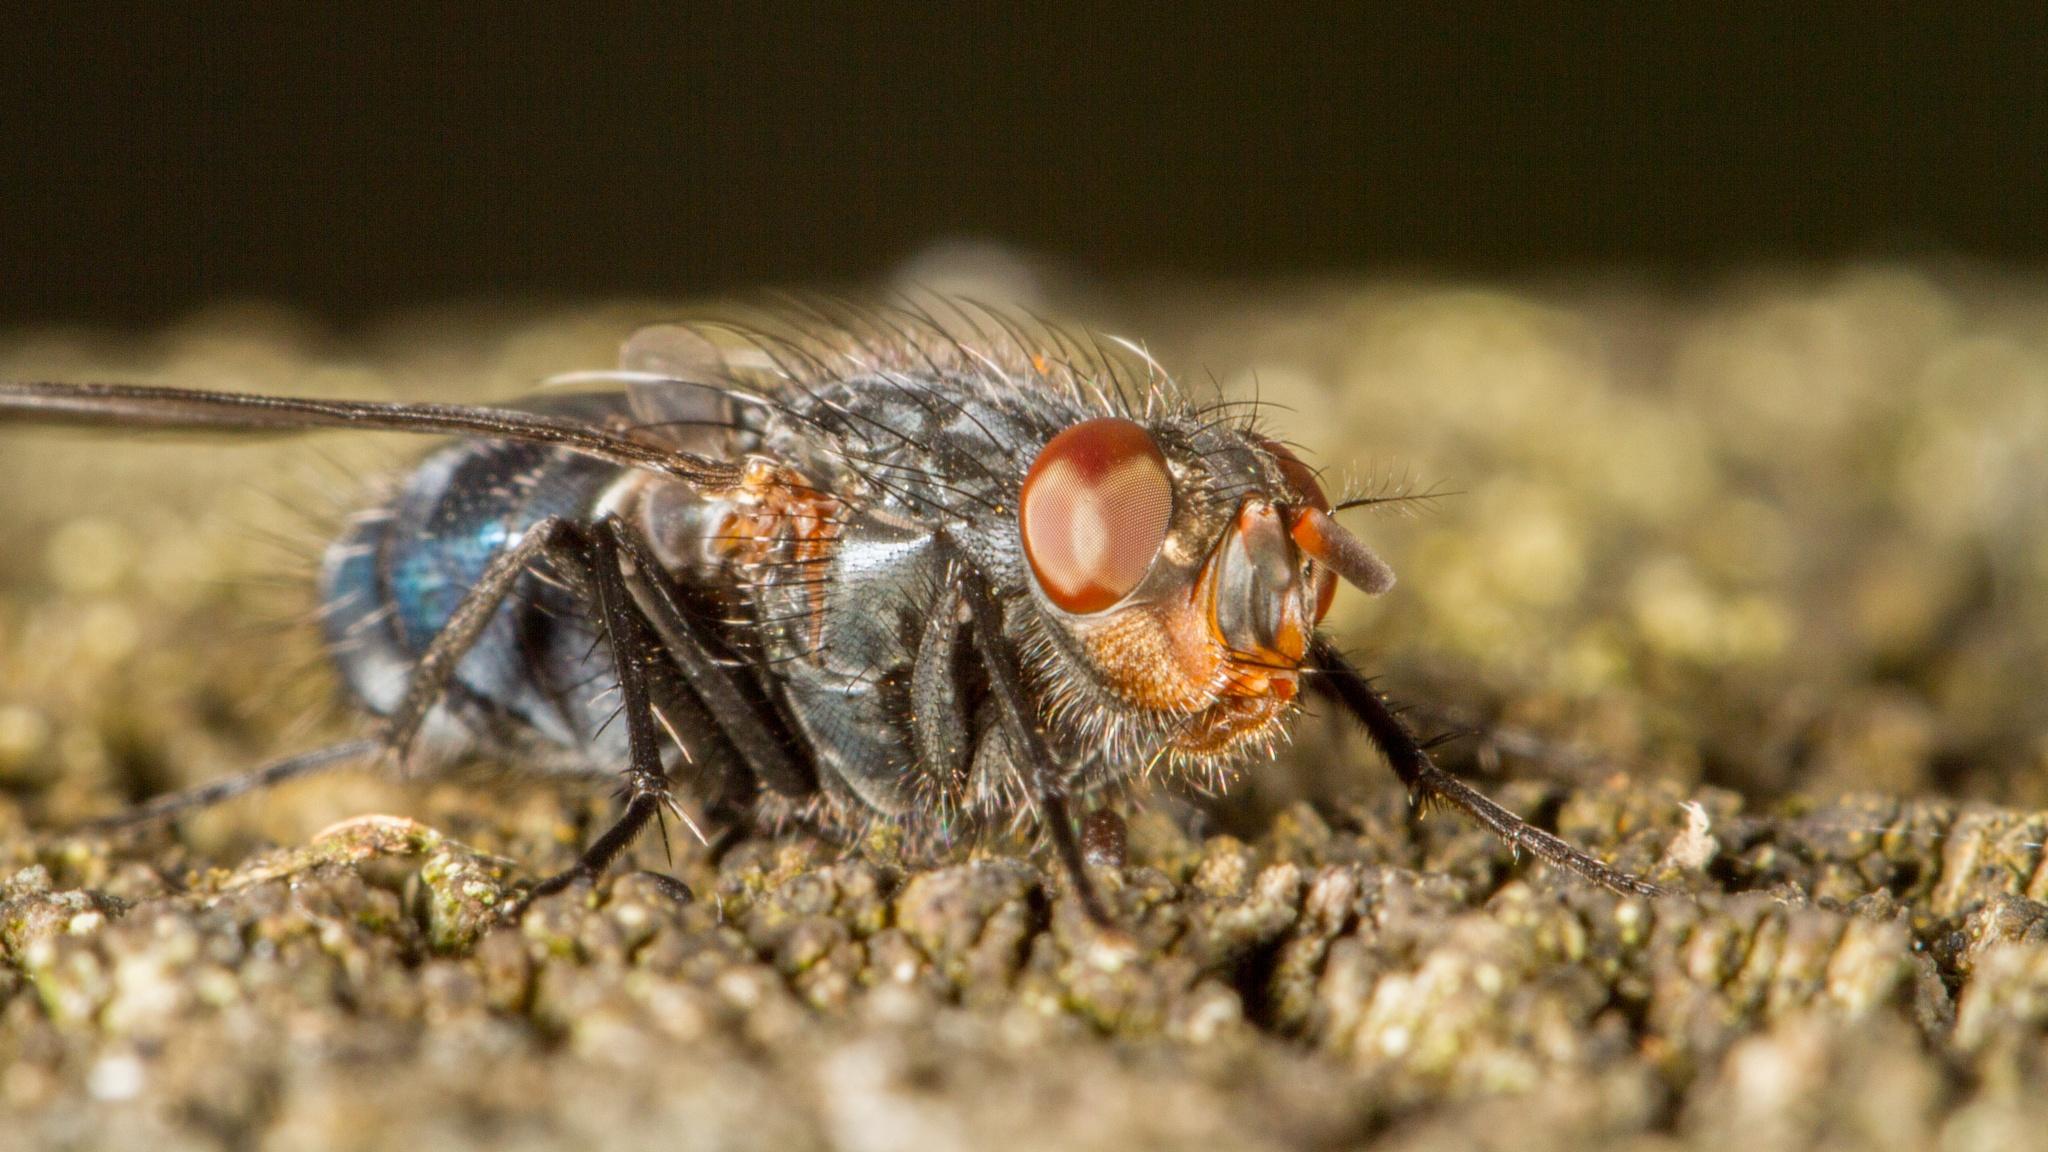 Blue Bottle Fly by David Arnold